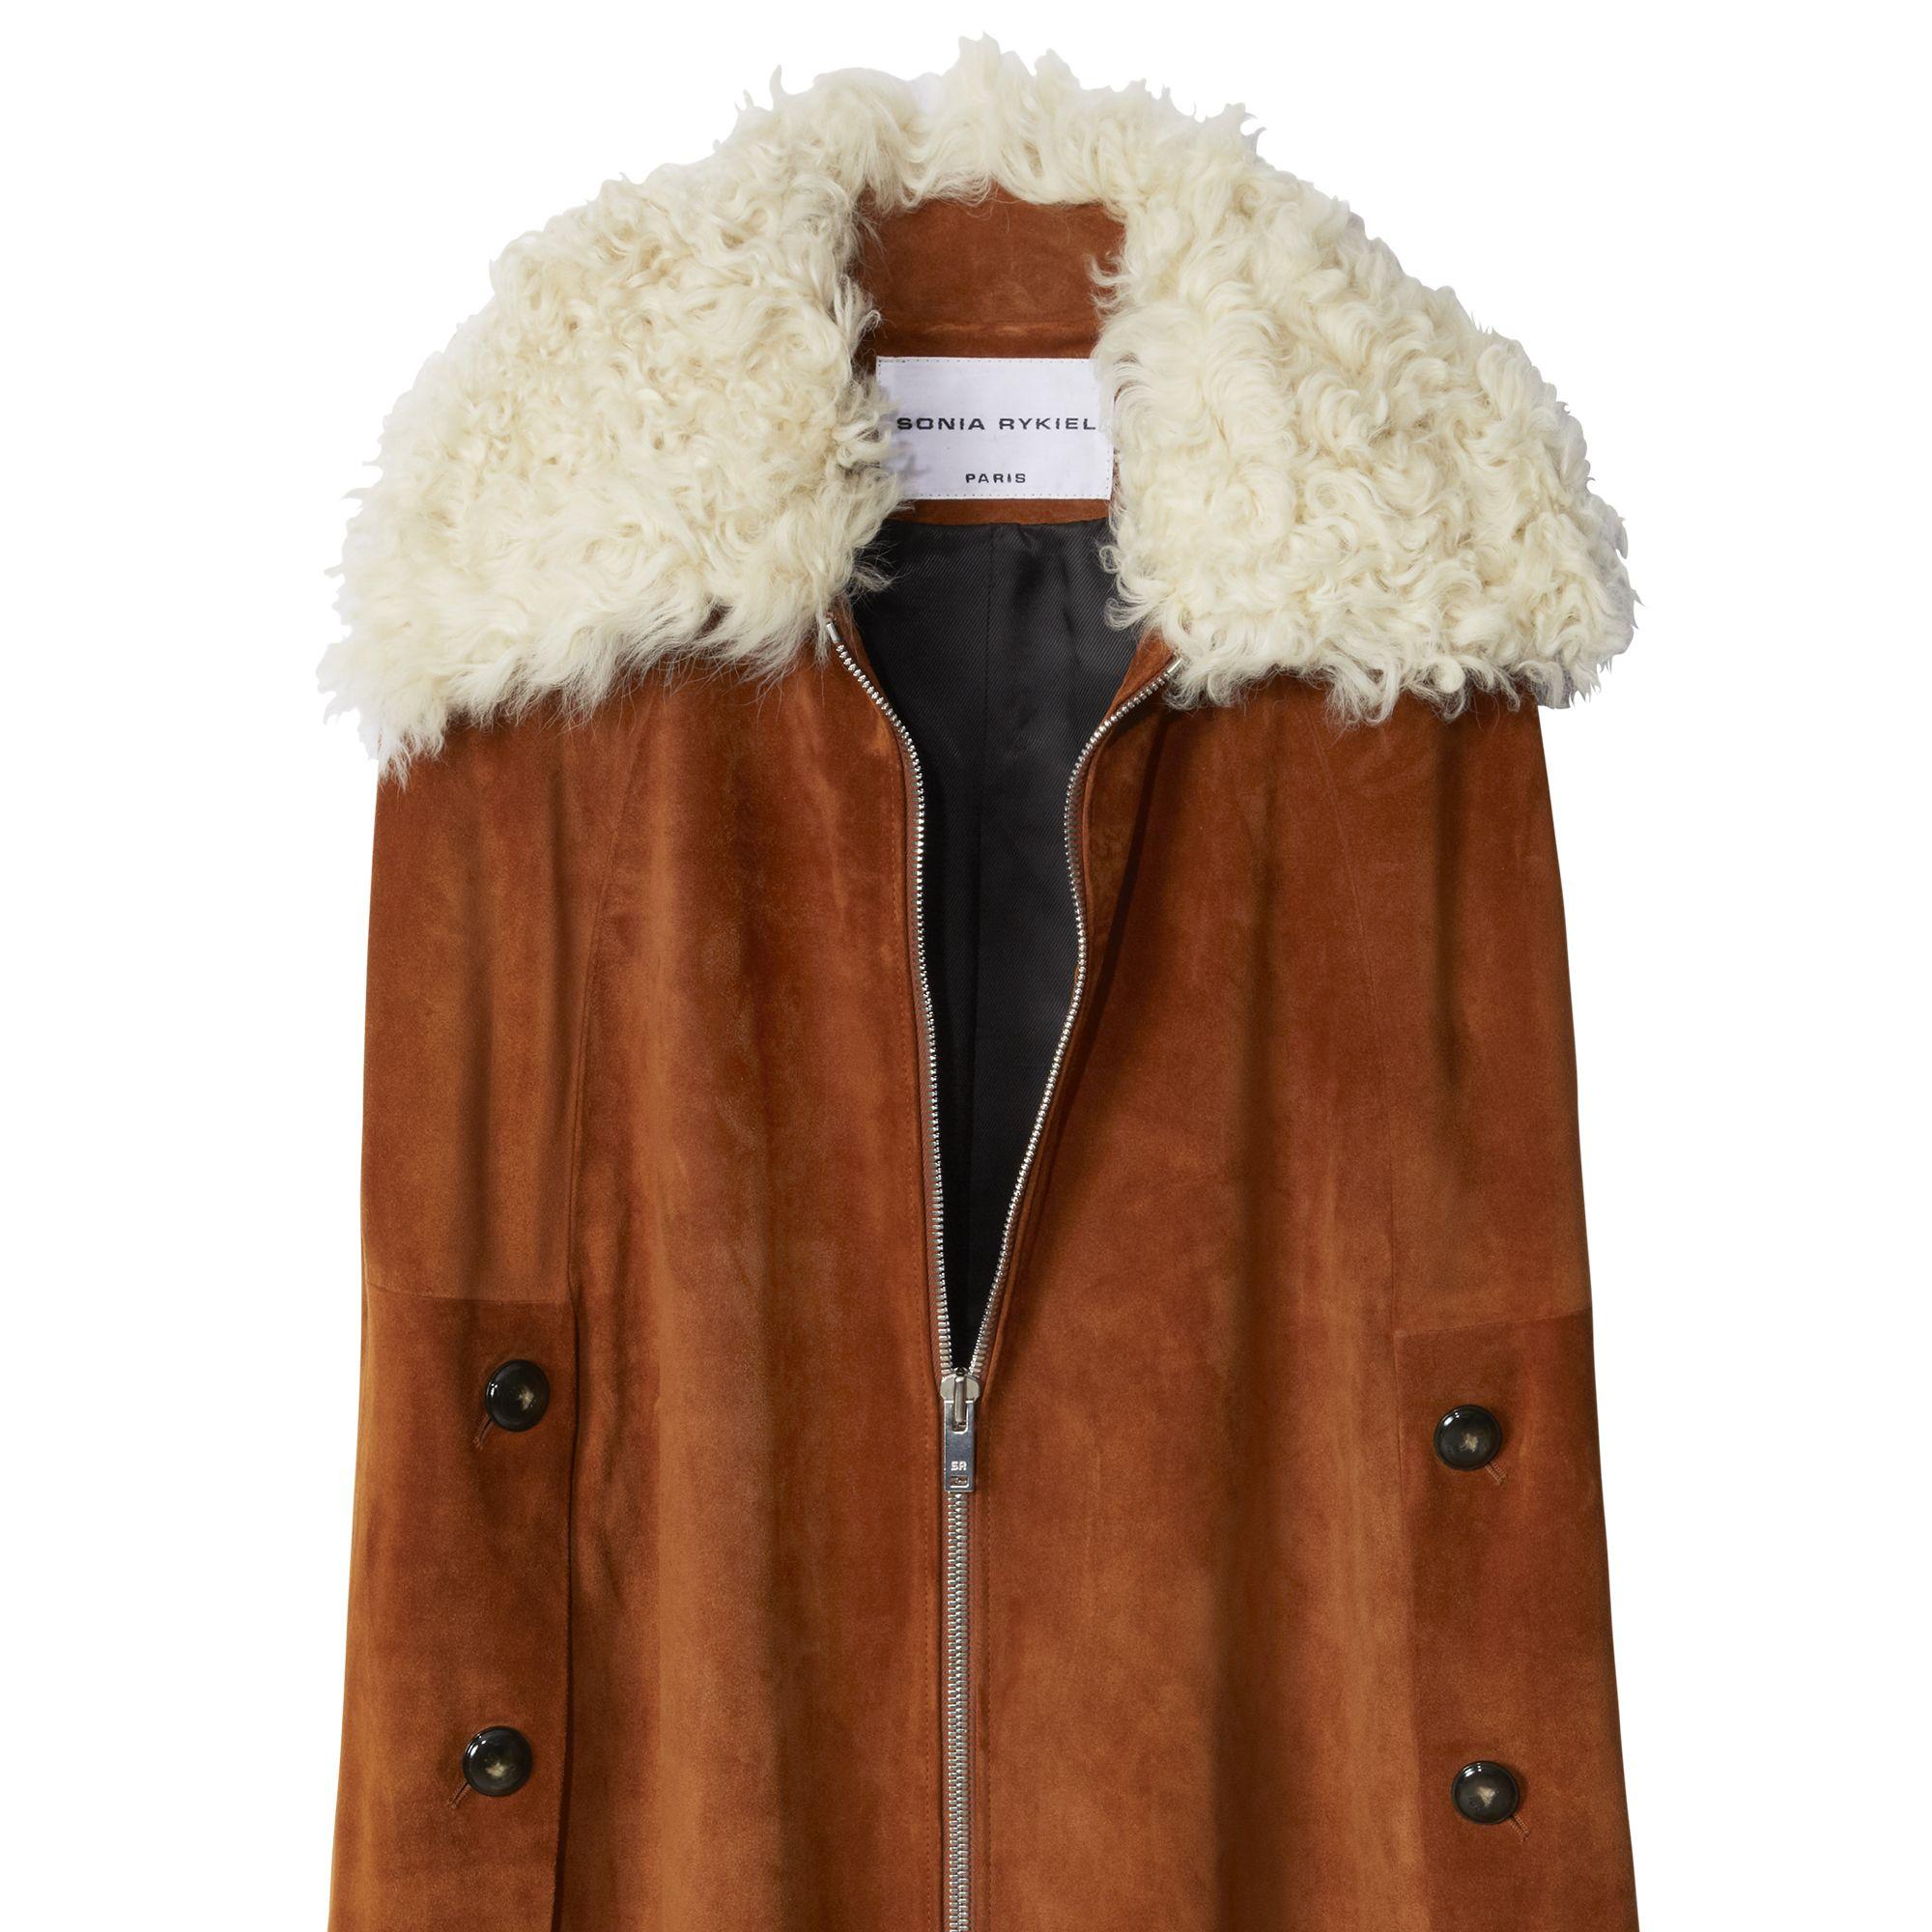 "<strong>Sonia Rykiel</strong> cape, $3,290, <a target=""_blank"" href=""http://shop.harpersbazaar.com/designers/sonia-rykiel/suede-shearling-cape/"">shopBAZAAR.com</a><img src=""http://assets.hdmtools.com/images/HBZ/Shop.svg"" class=""icon shop"">."